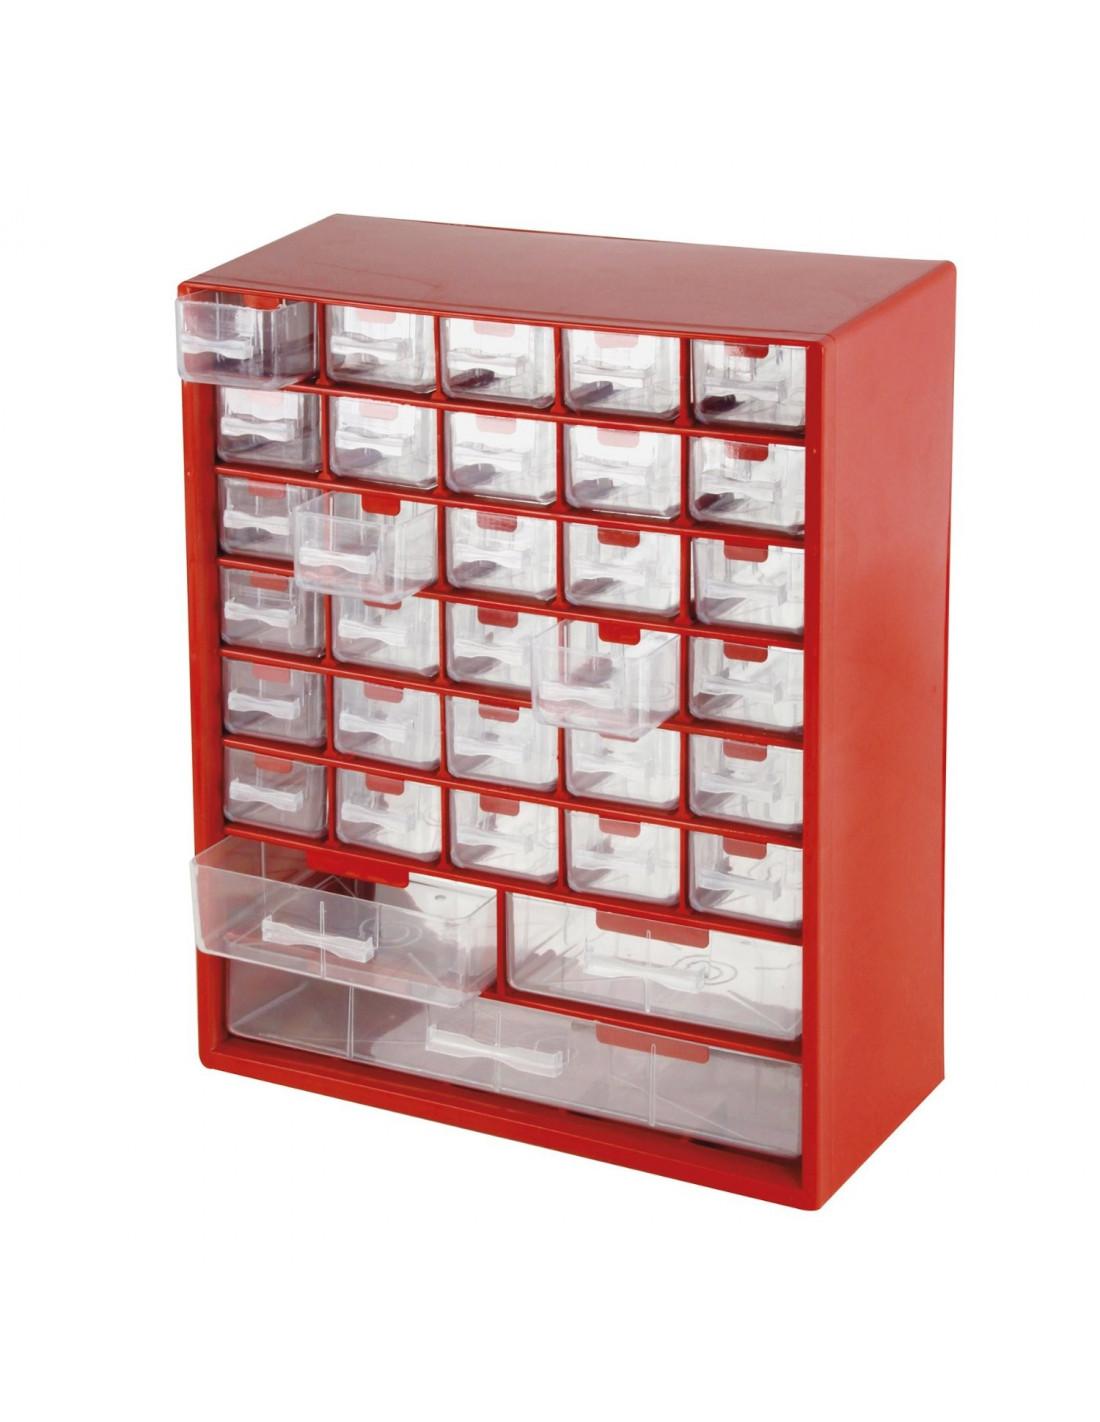 cogex casier rangement plastique 33 tiroirs 290 x 340 x 125 mm hyper brico. Black Bedroom Furniture Sets. Home Design Ideas